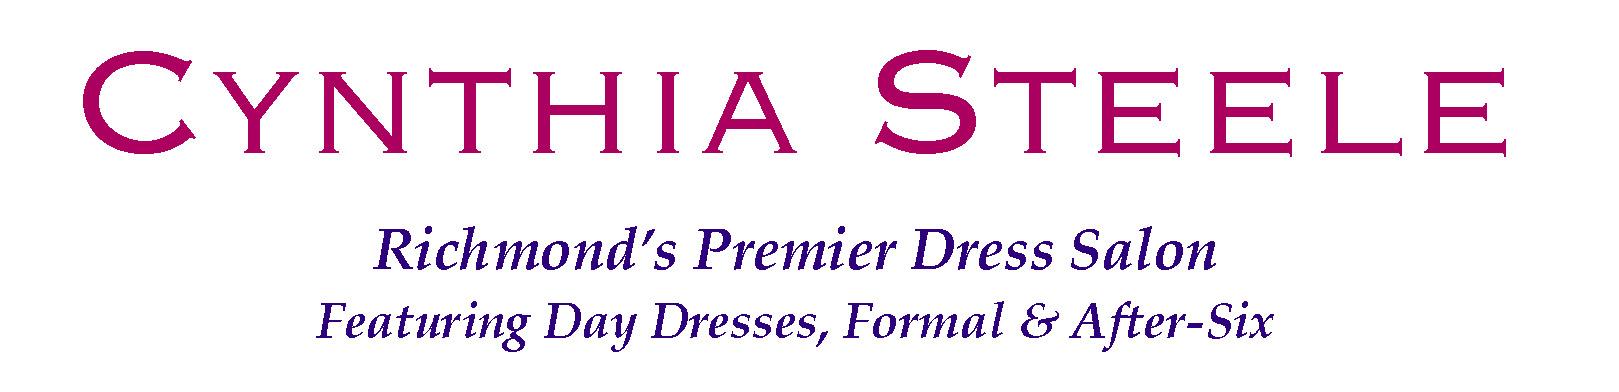 cynthia_steele_logo